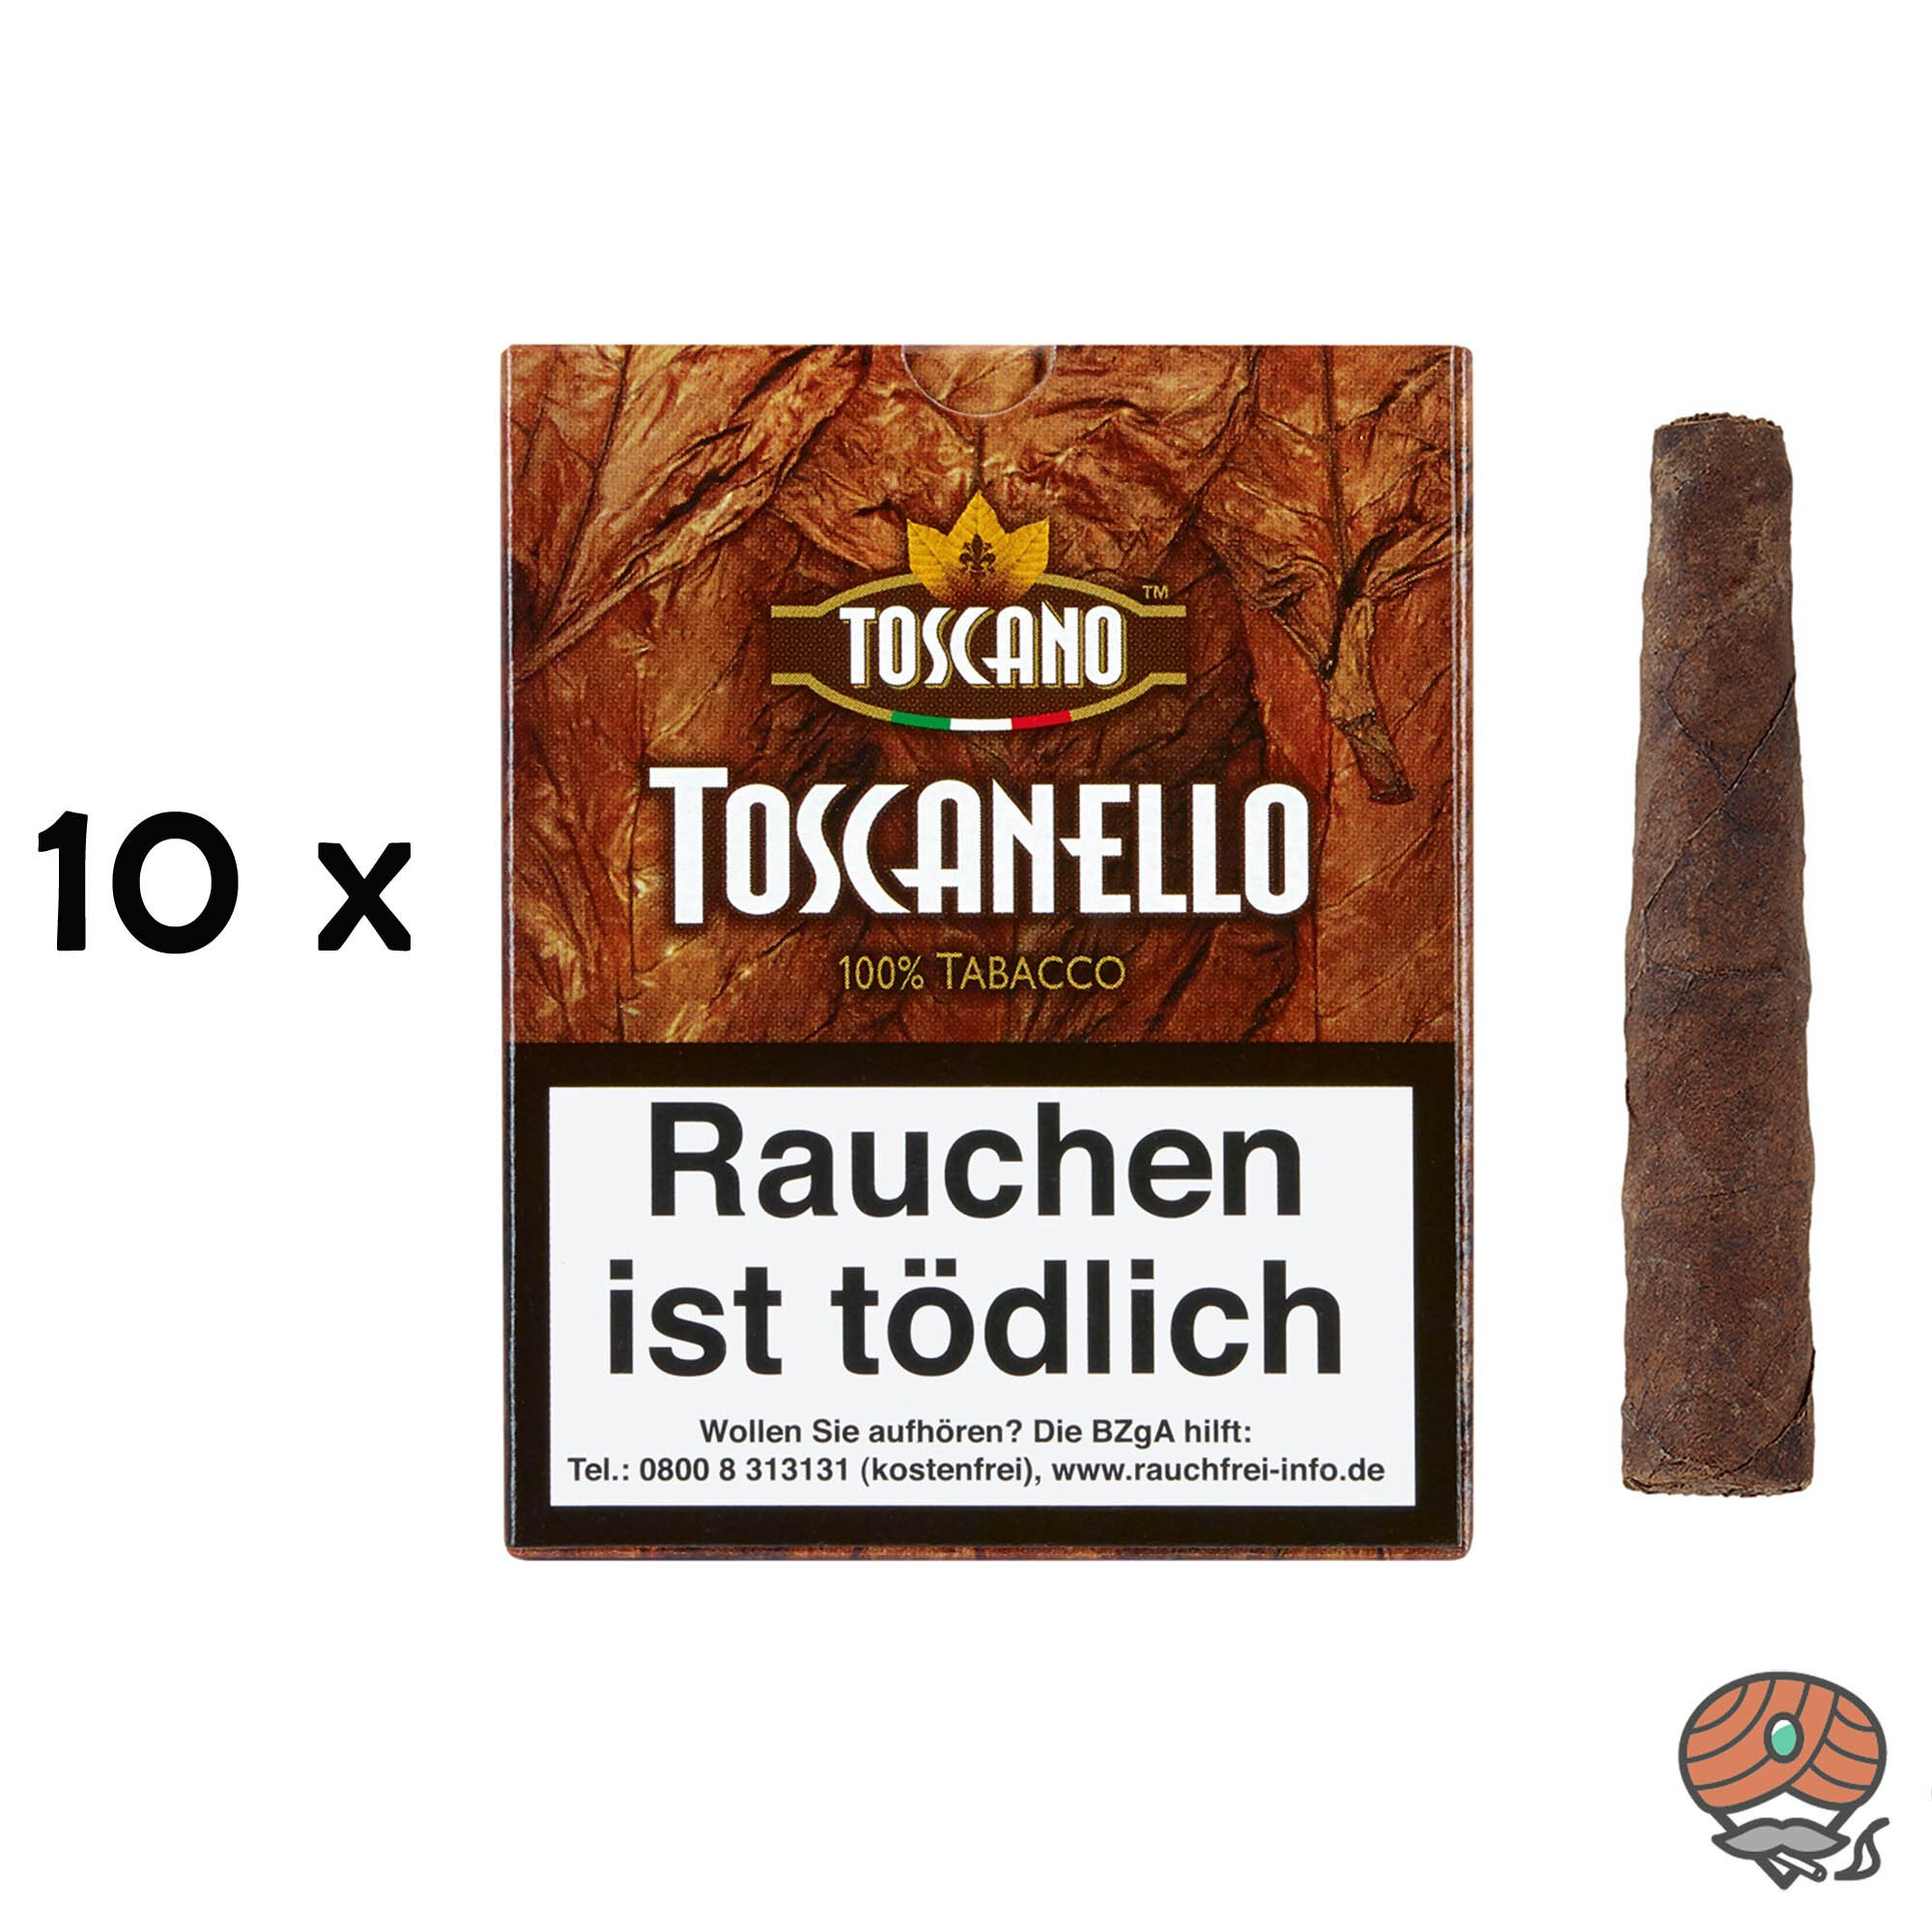 10 Schachteln Toscano Toscanello 100% Tabacco Zigarren 5 Stück